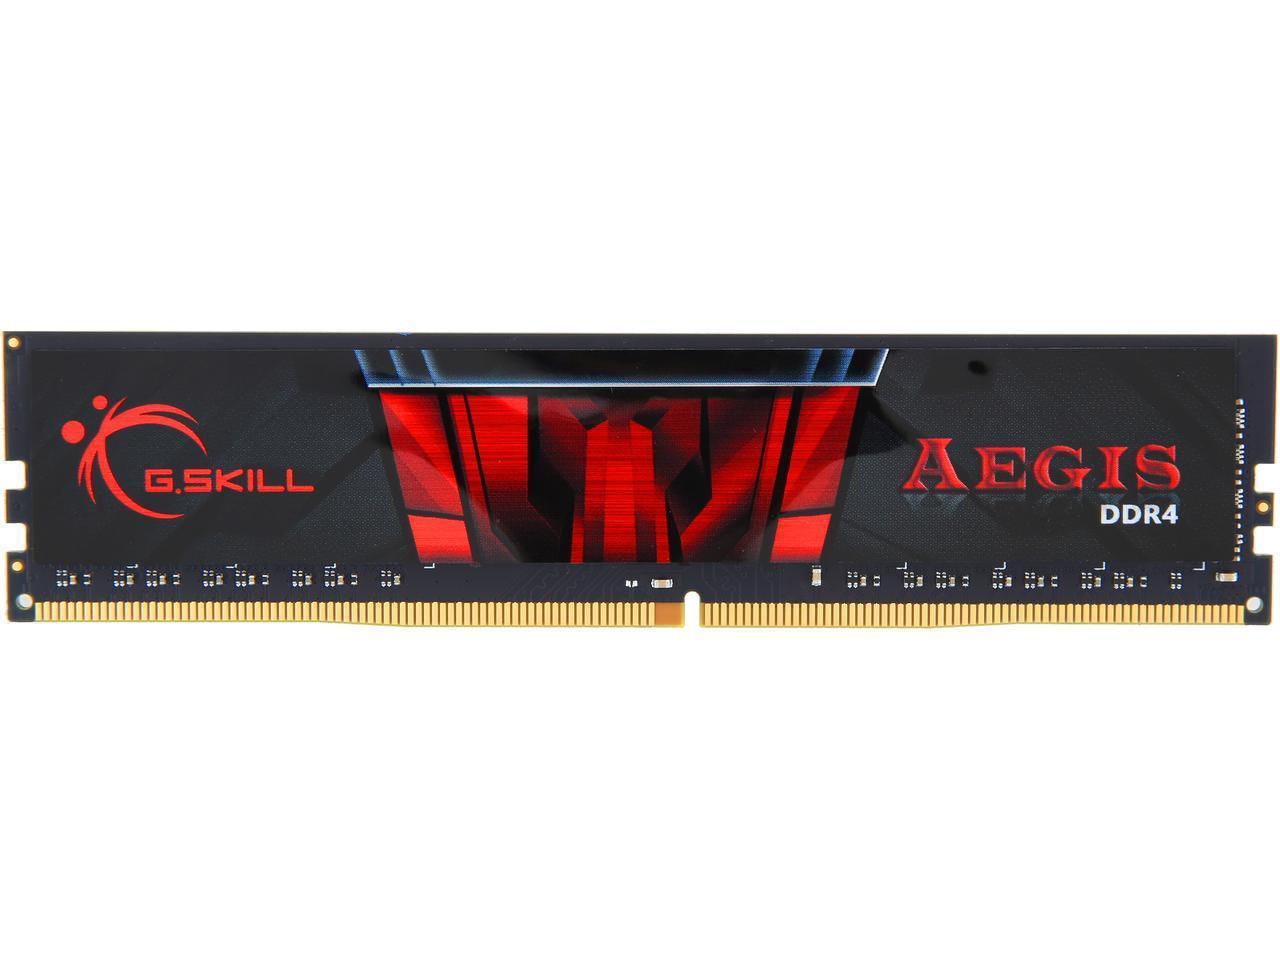 Newegg: Memoria RAM - G.SKILL Aegis 8GB DDR4 SDRAM DDR4 2666 MHz